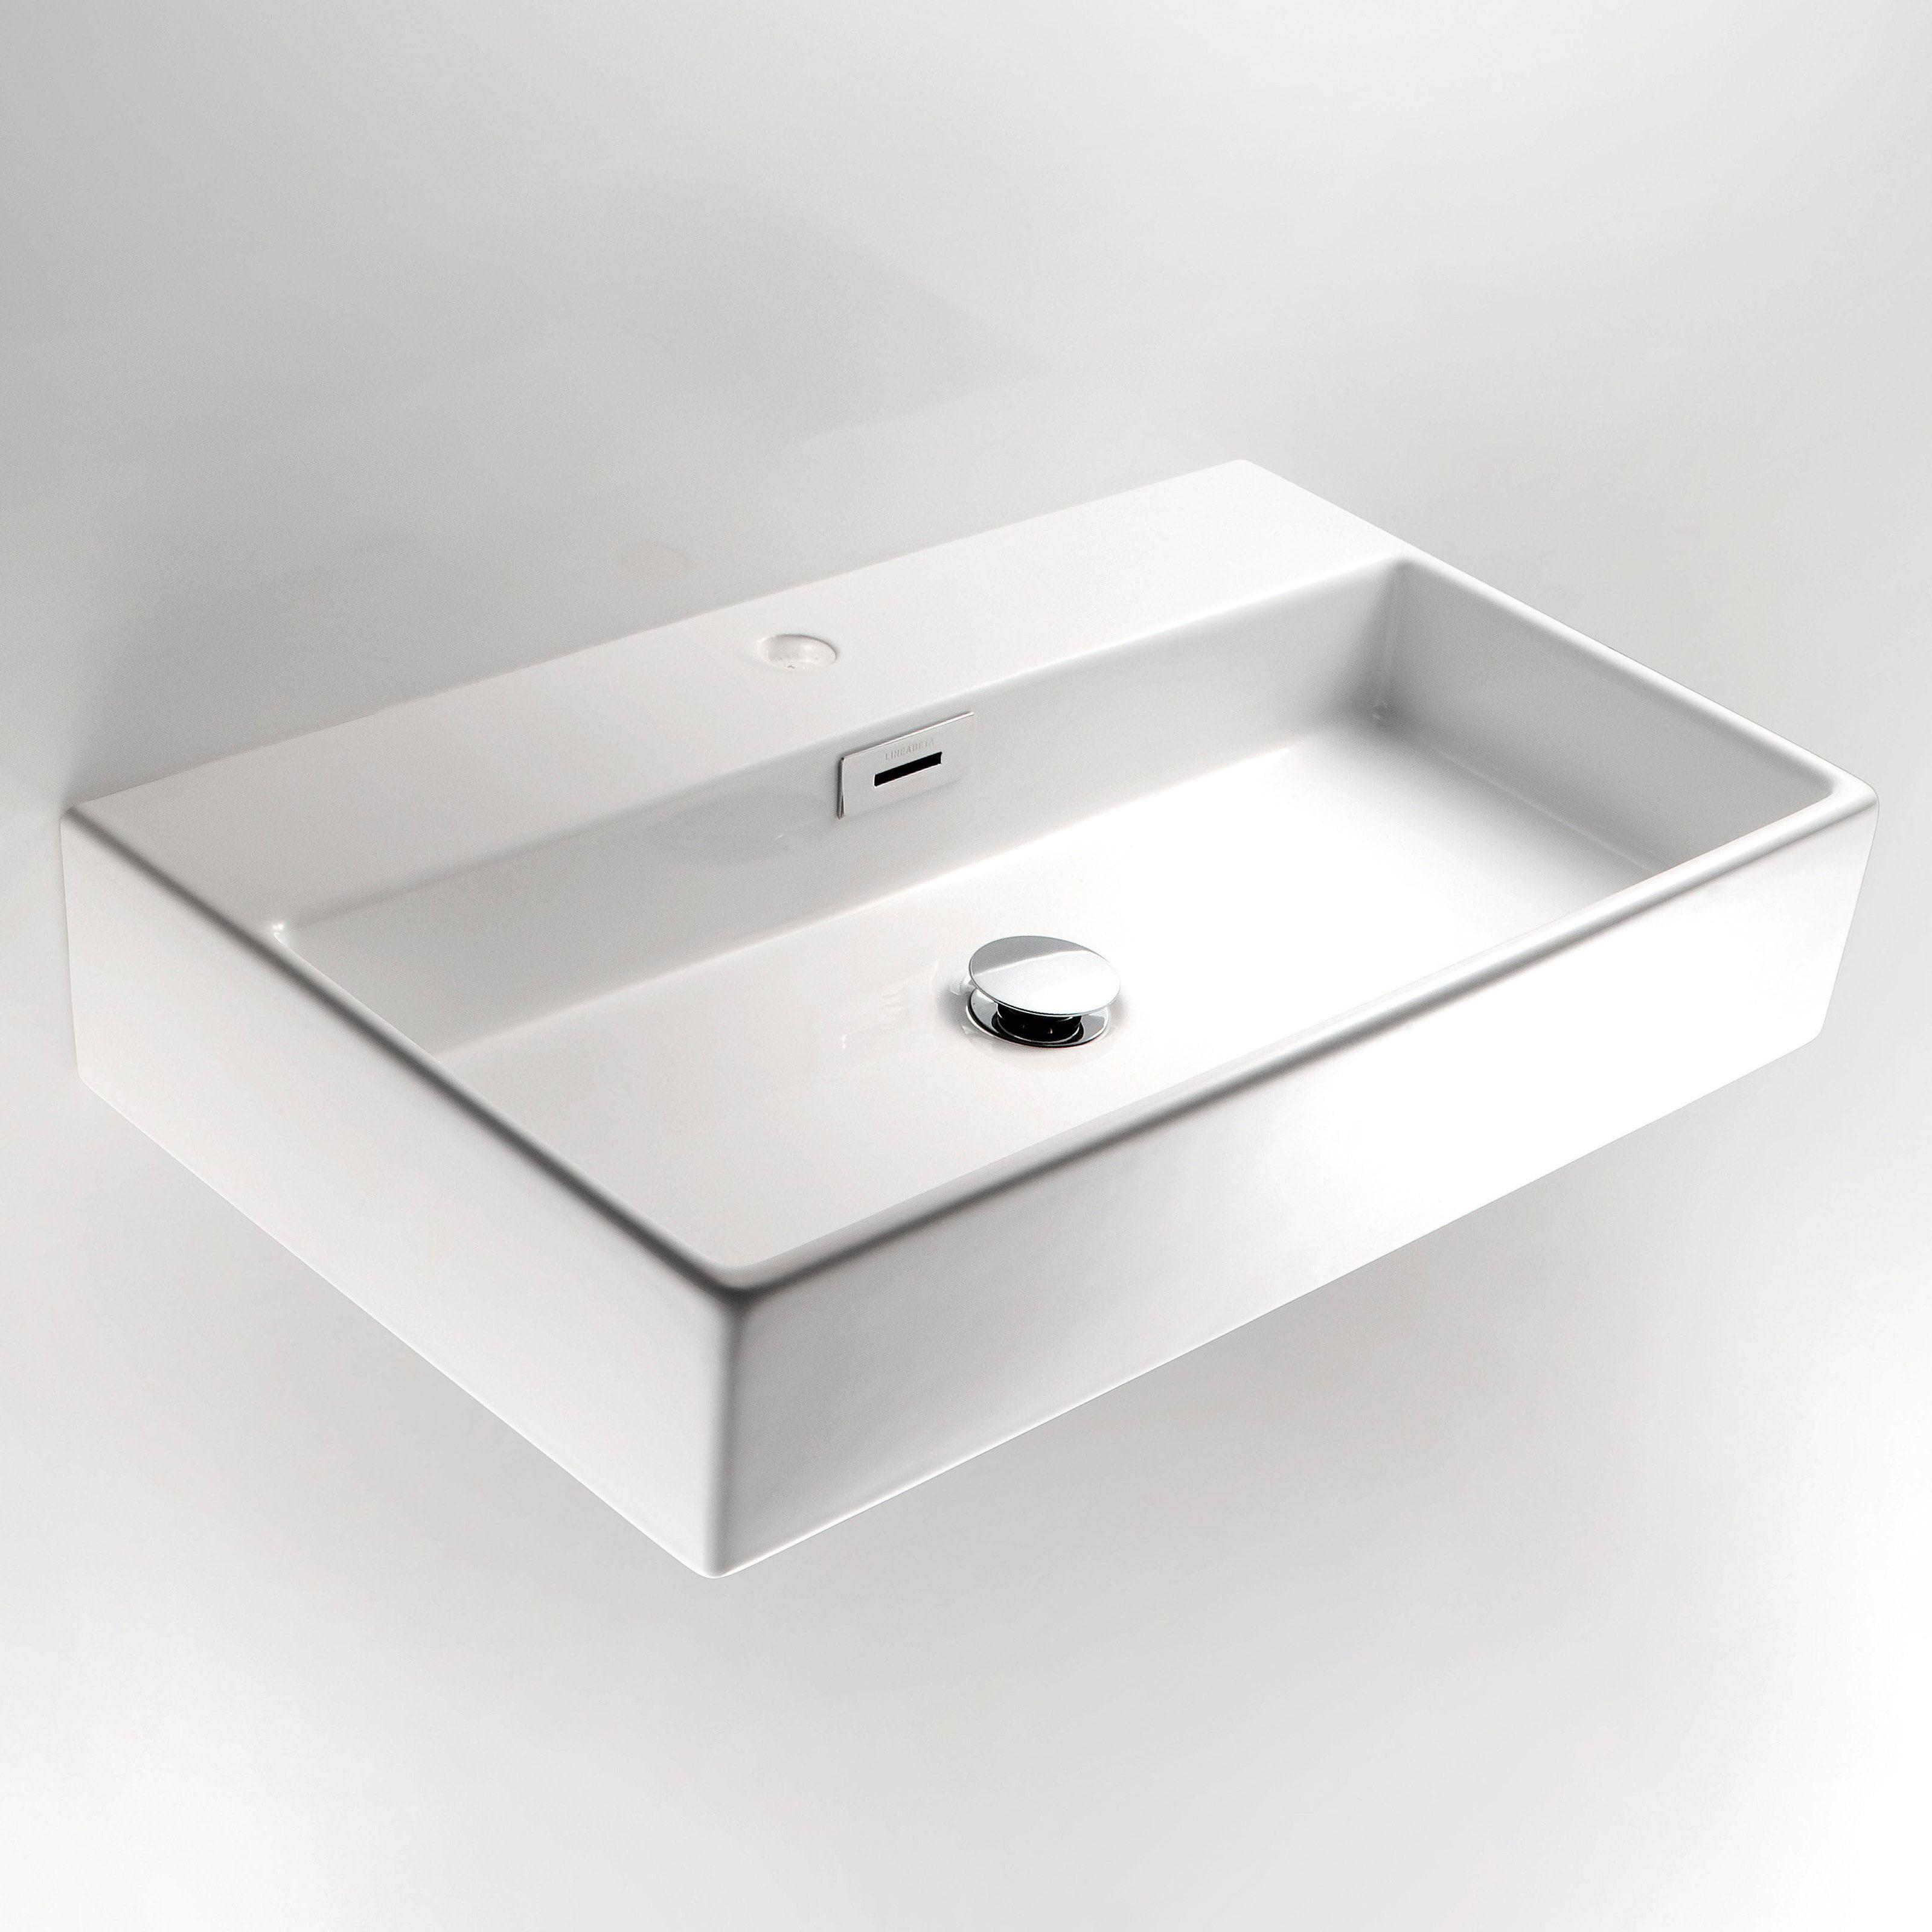 WS Bath Collections Quarelo 53709 Wall Mount Bathroom Sink